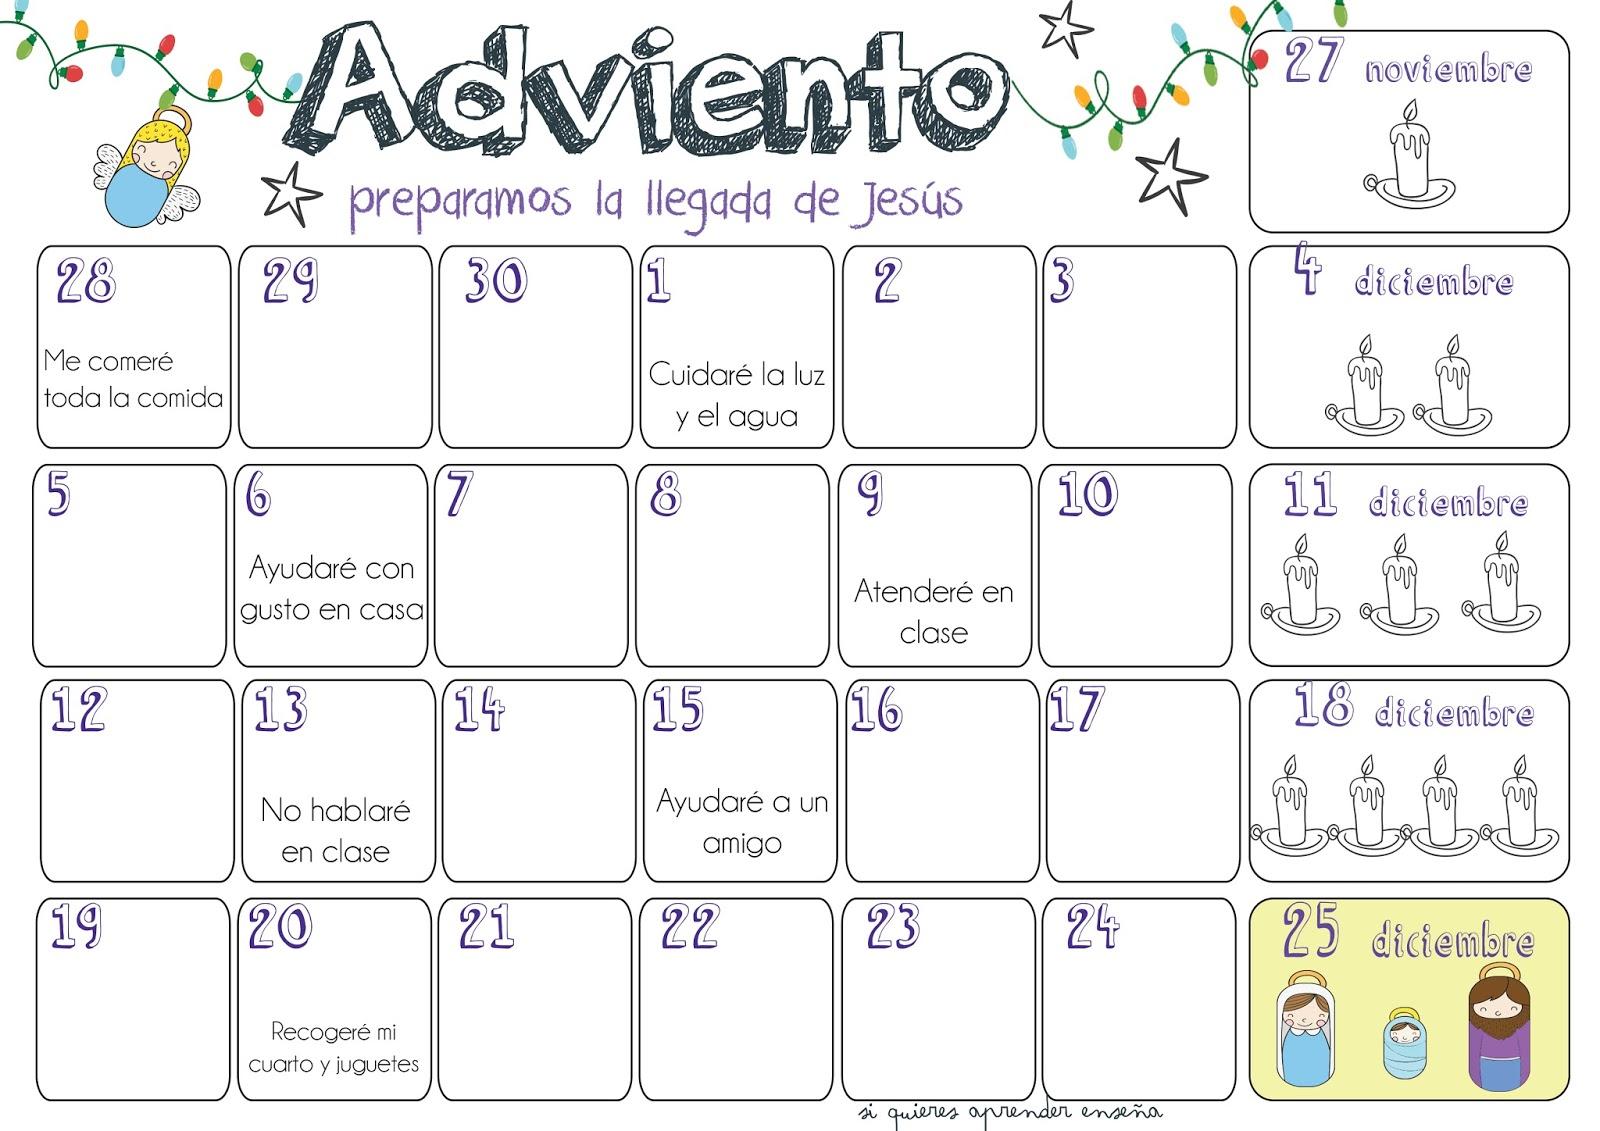 Si quieres aprender ense a calendario adviento 2016 for Calendario adviento 2017